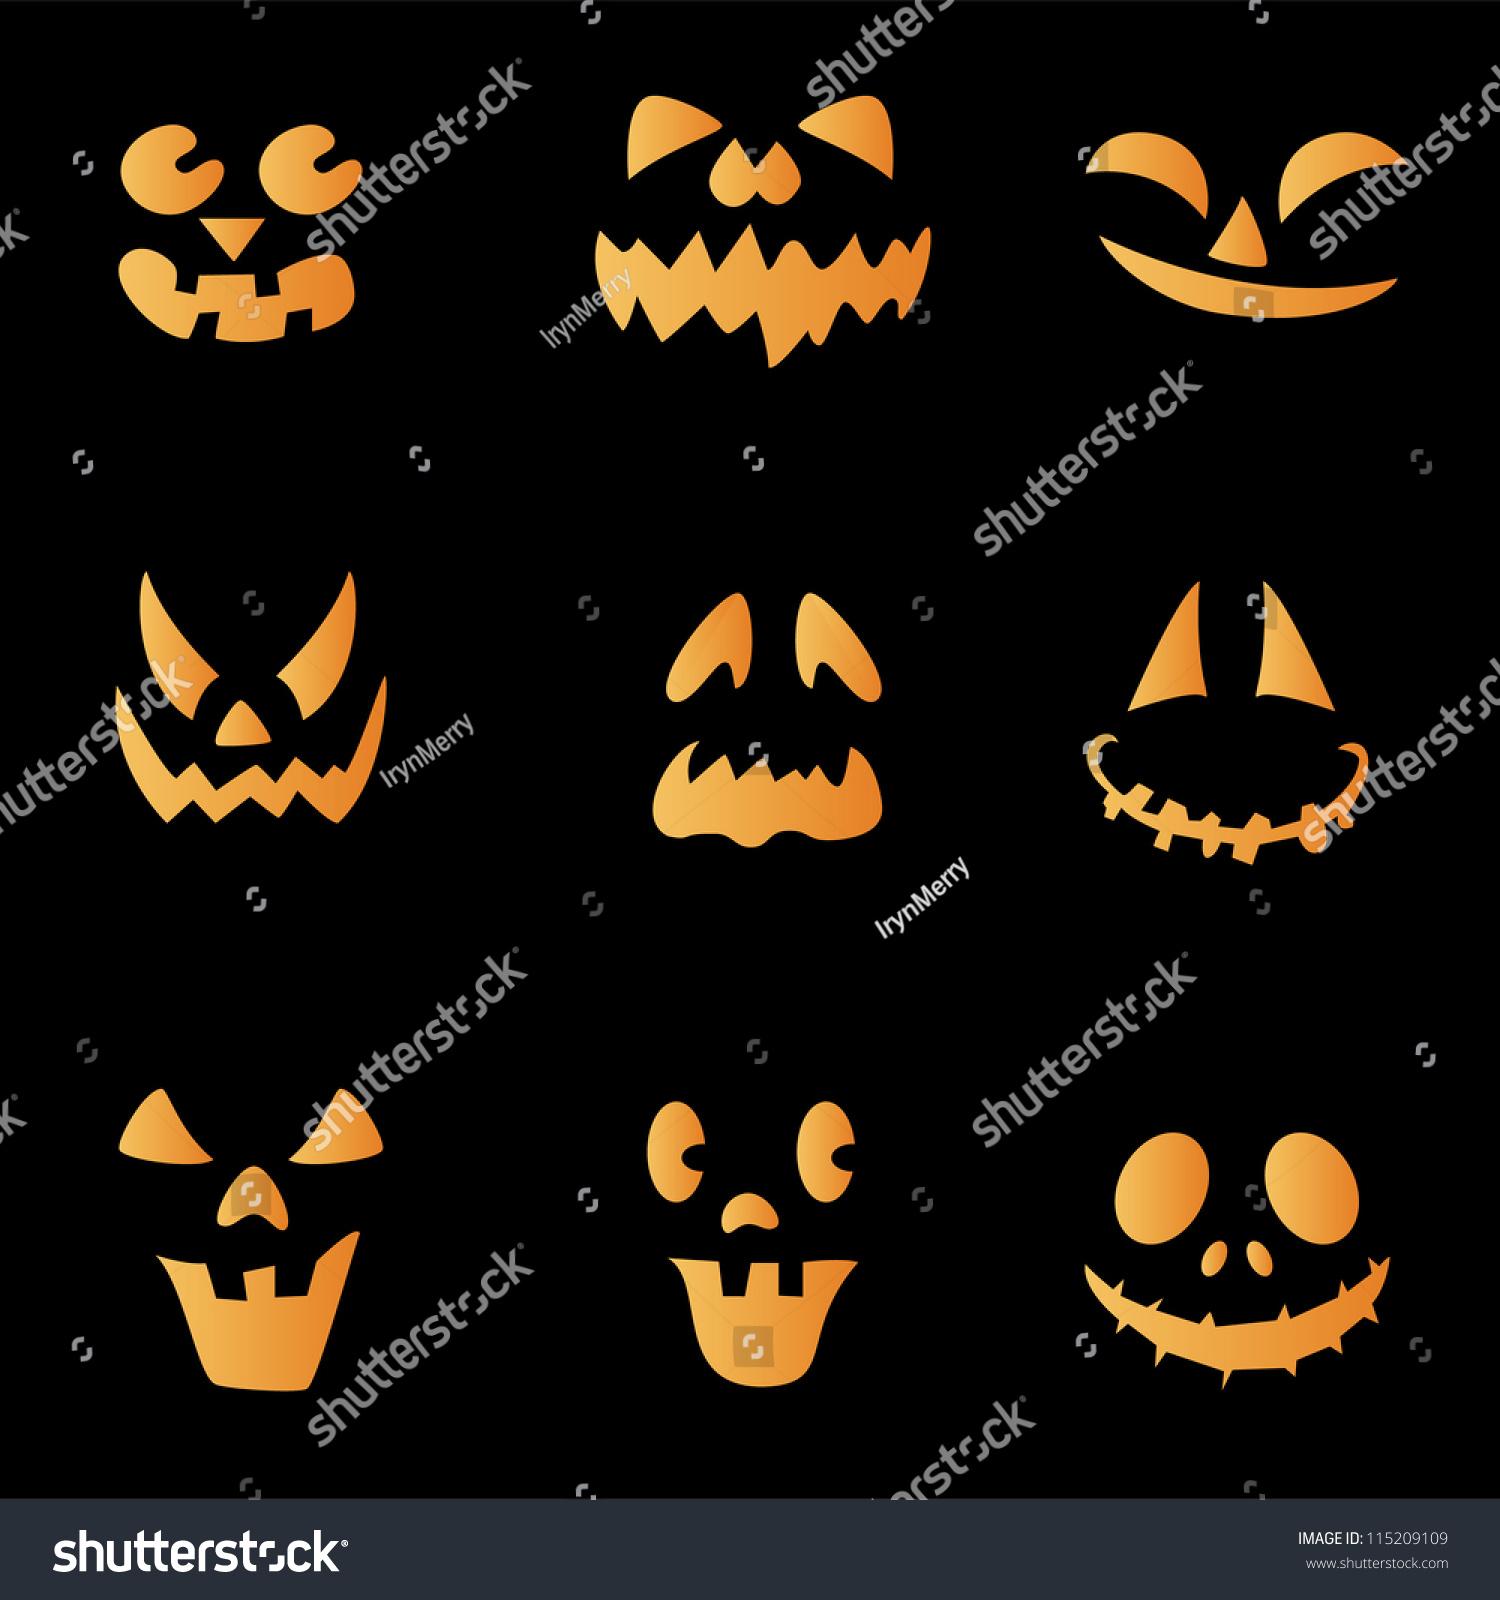 scary faces of halloween pumpkin vector - Halloween Scary Faces